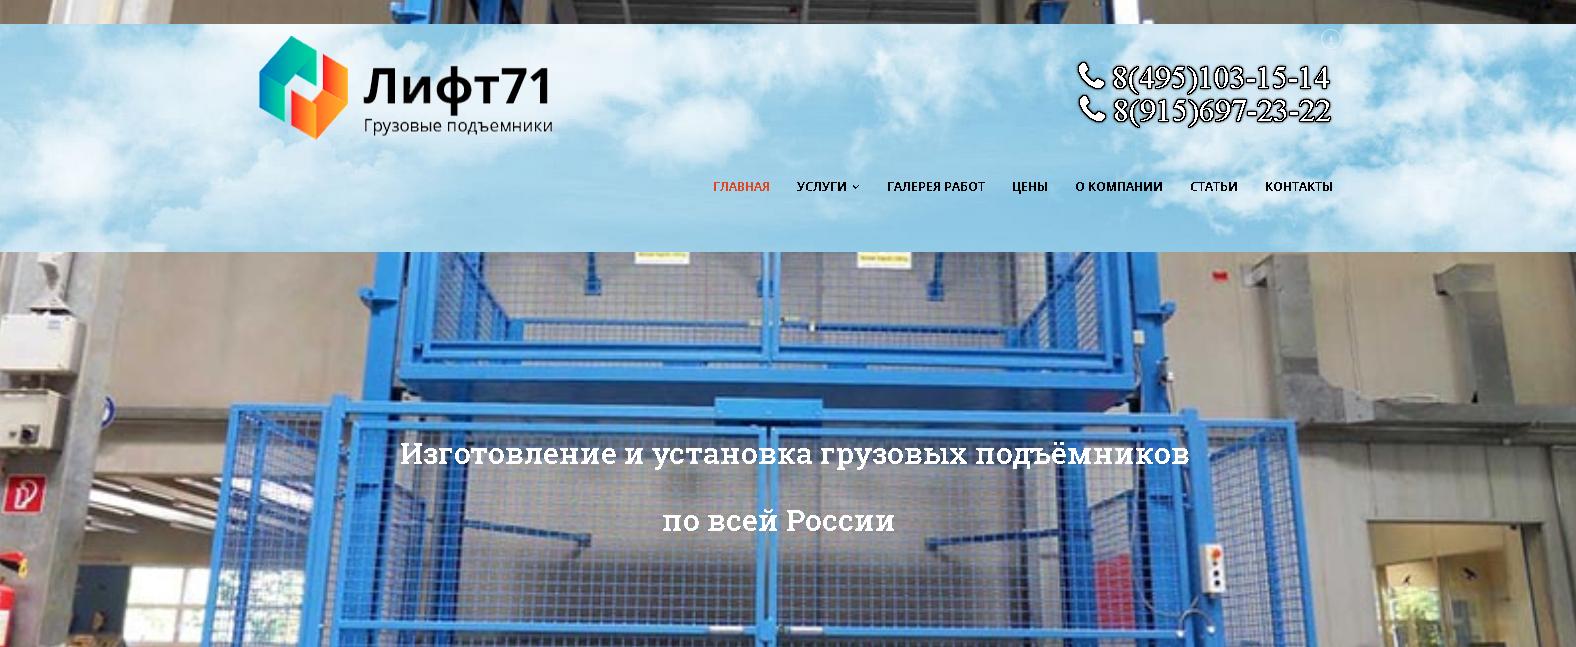 Сайт Лифт71